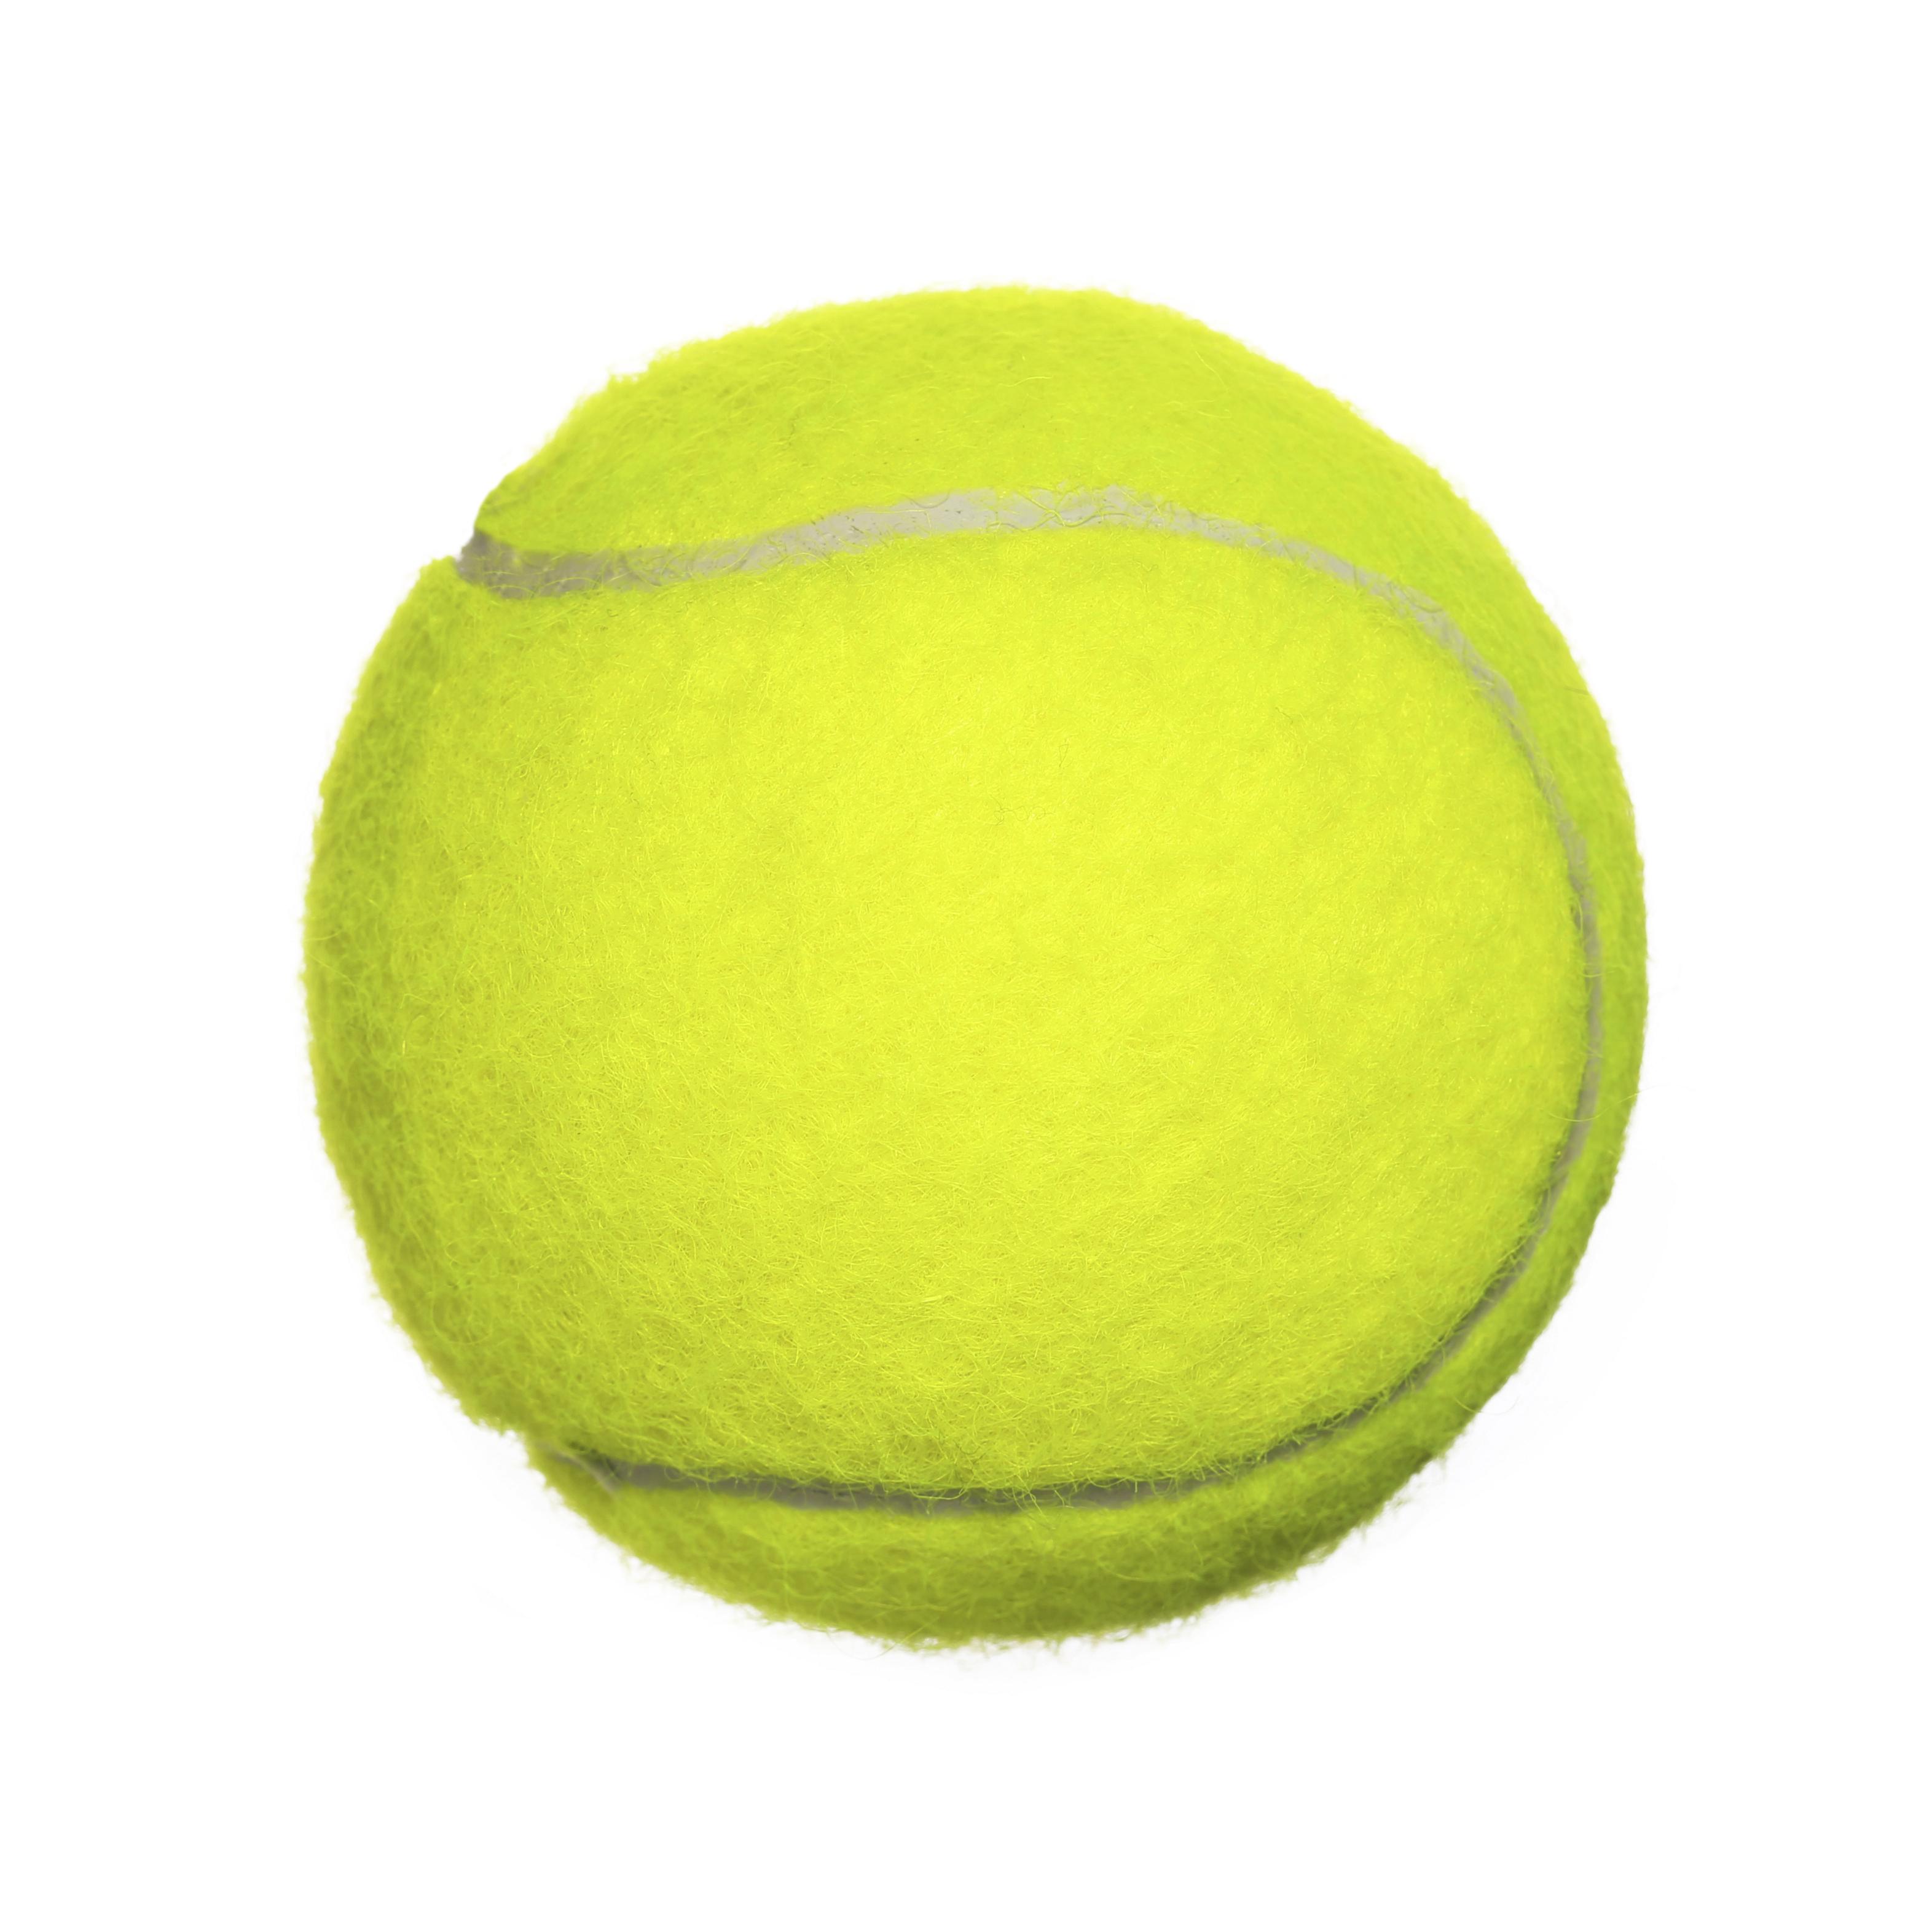 3144x3144 Tennis ball ball collection clipart